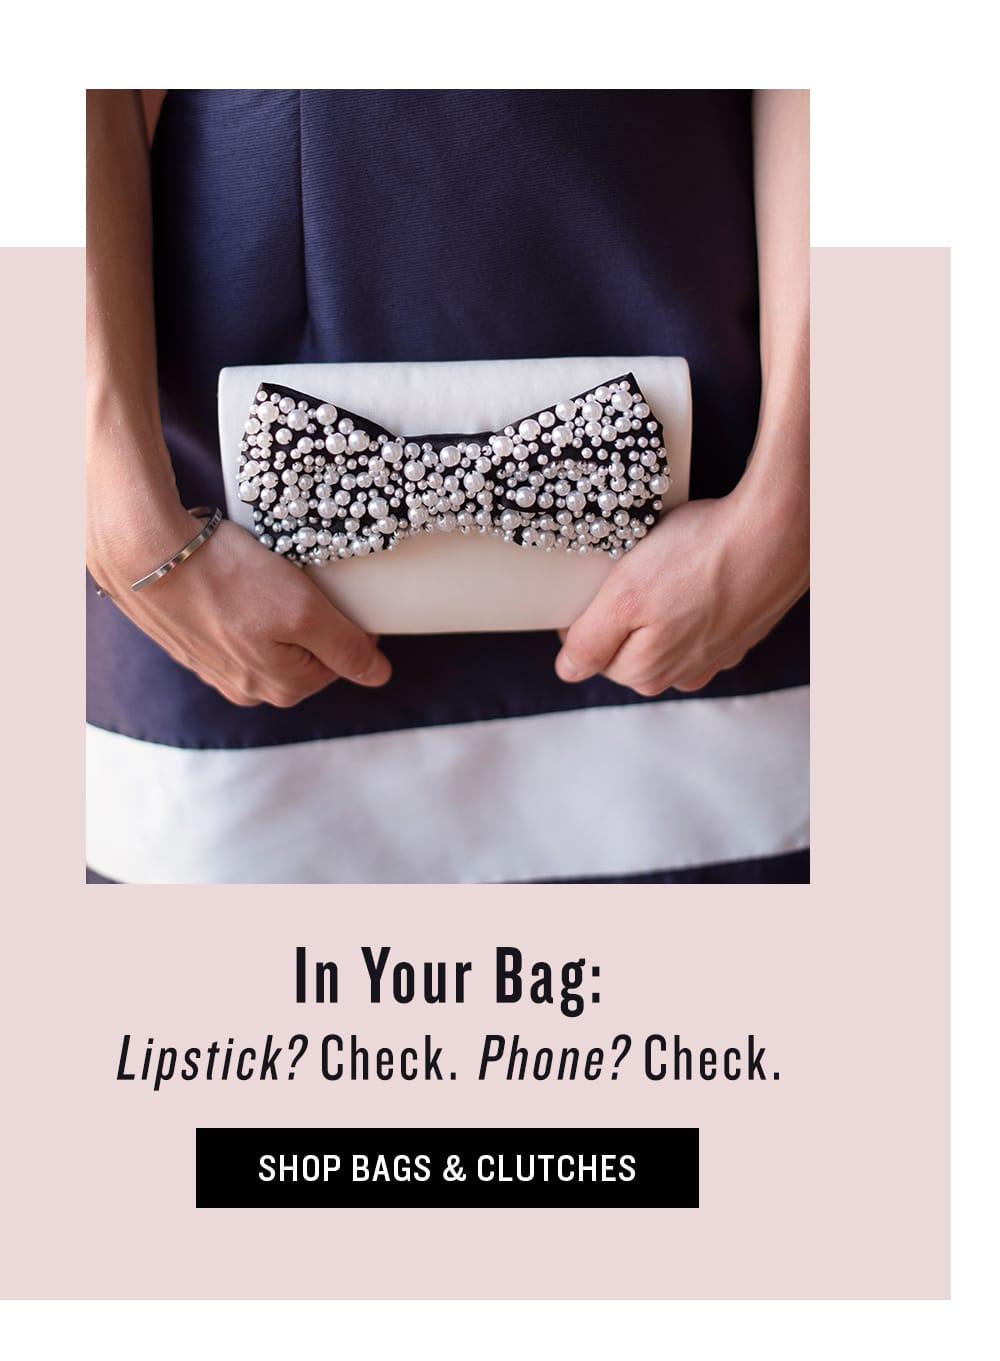 Shop Bags & Clutches